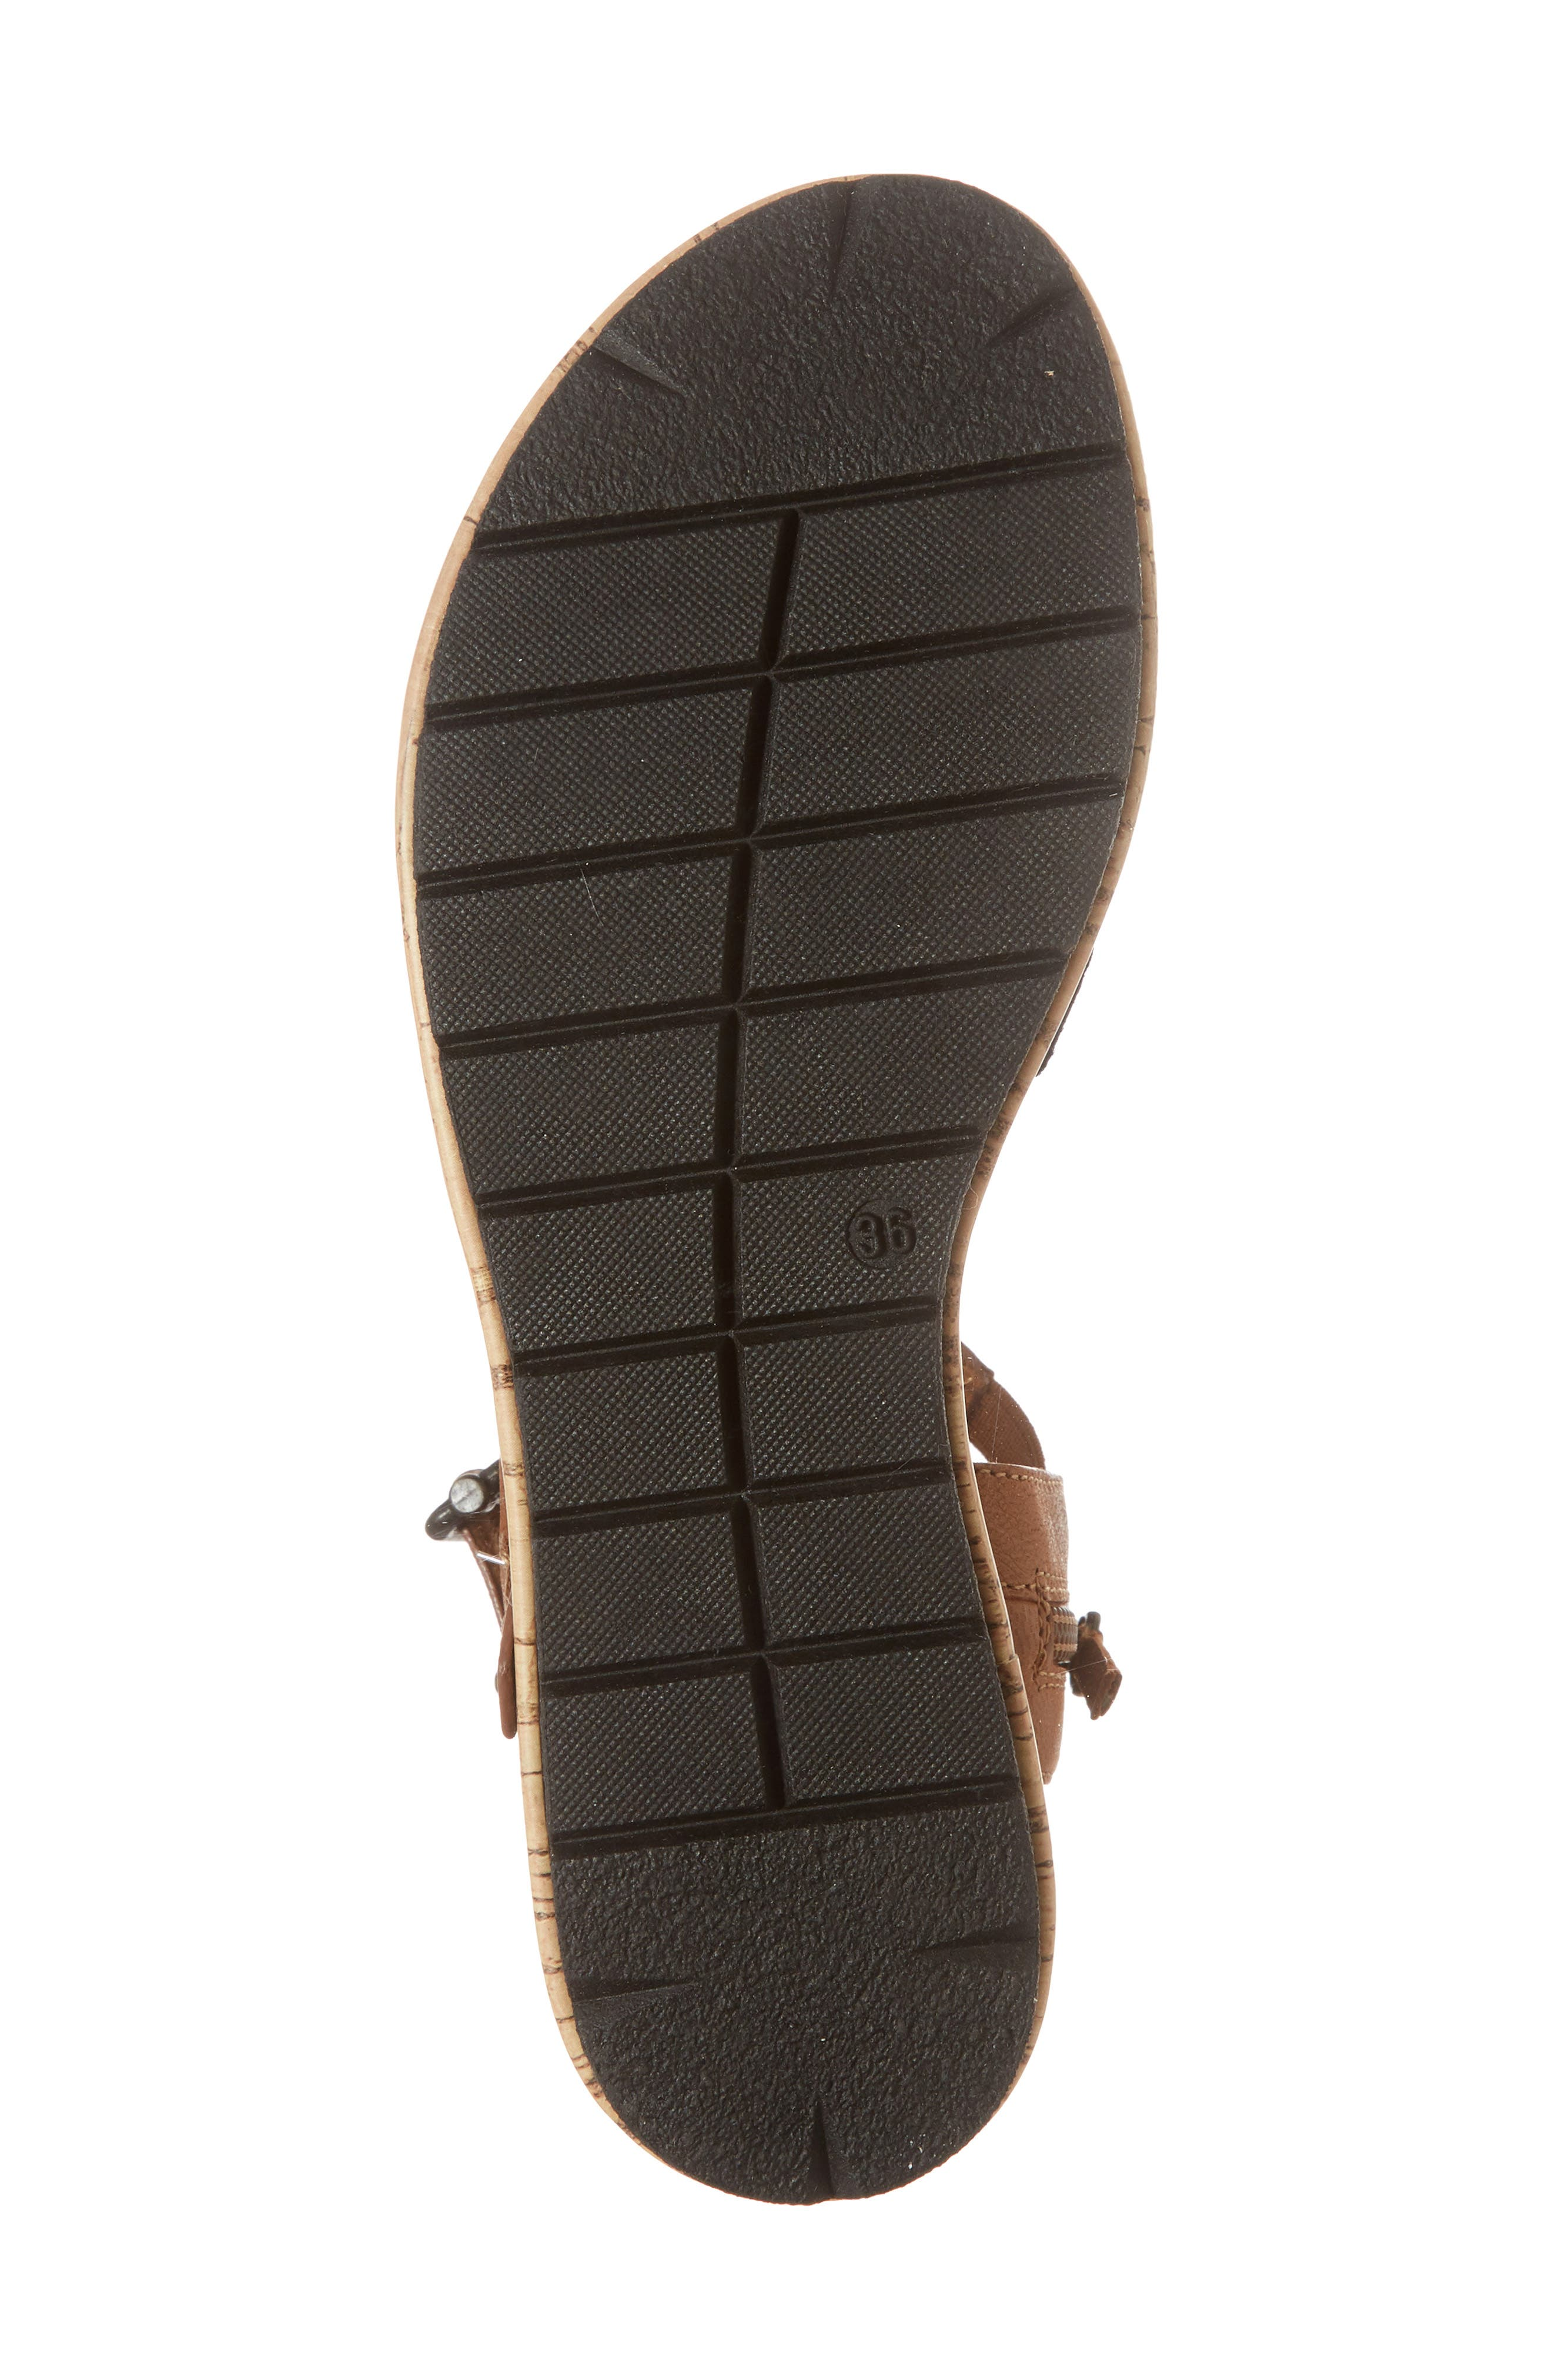 Eda Diagonal Strap Wedge Sandal,                             Alternate thumbnail 6, color,                             413